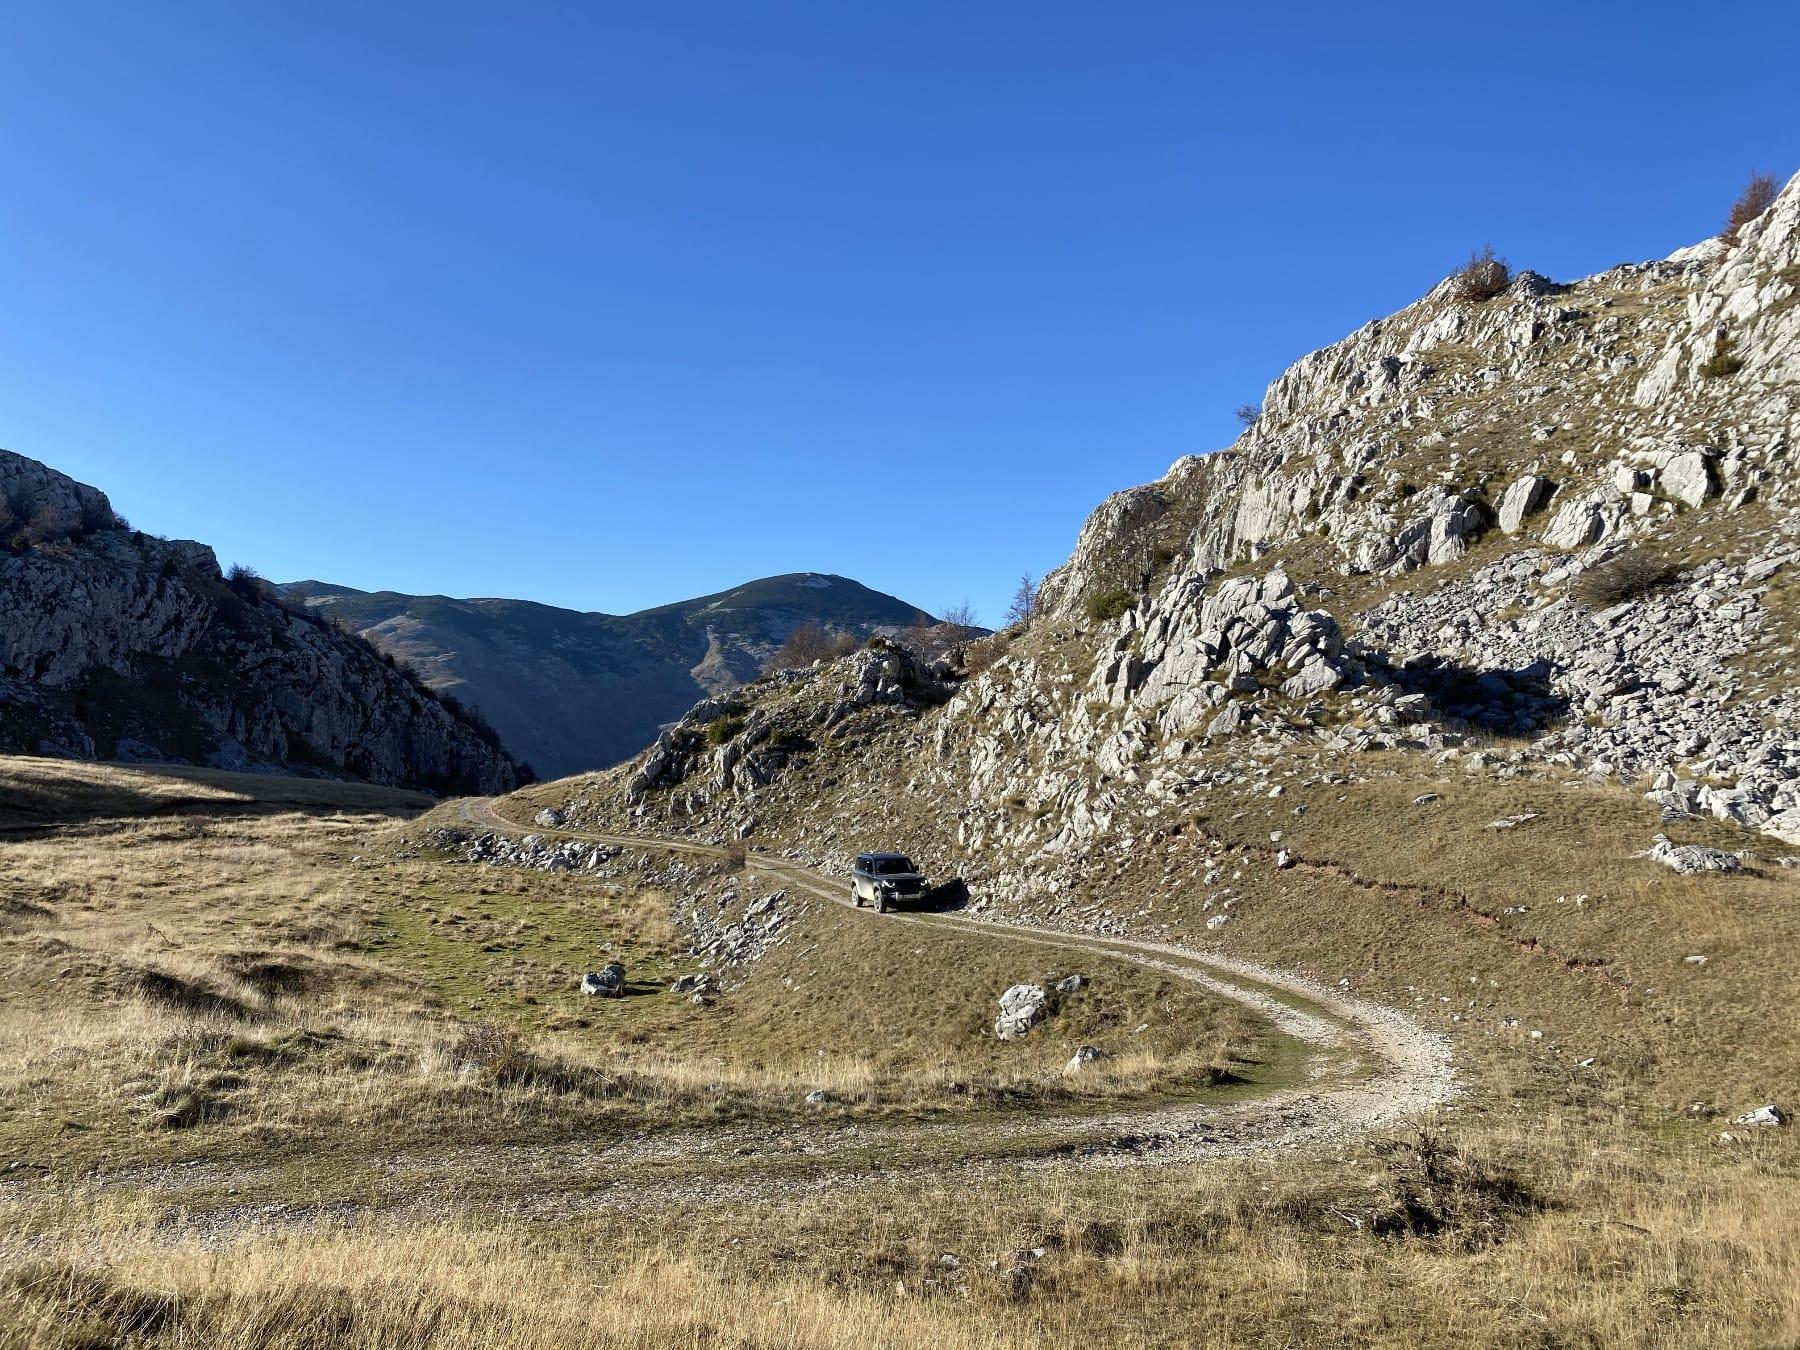 Mountain Village Umoljani - In Search of the Stone Dragon 2